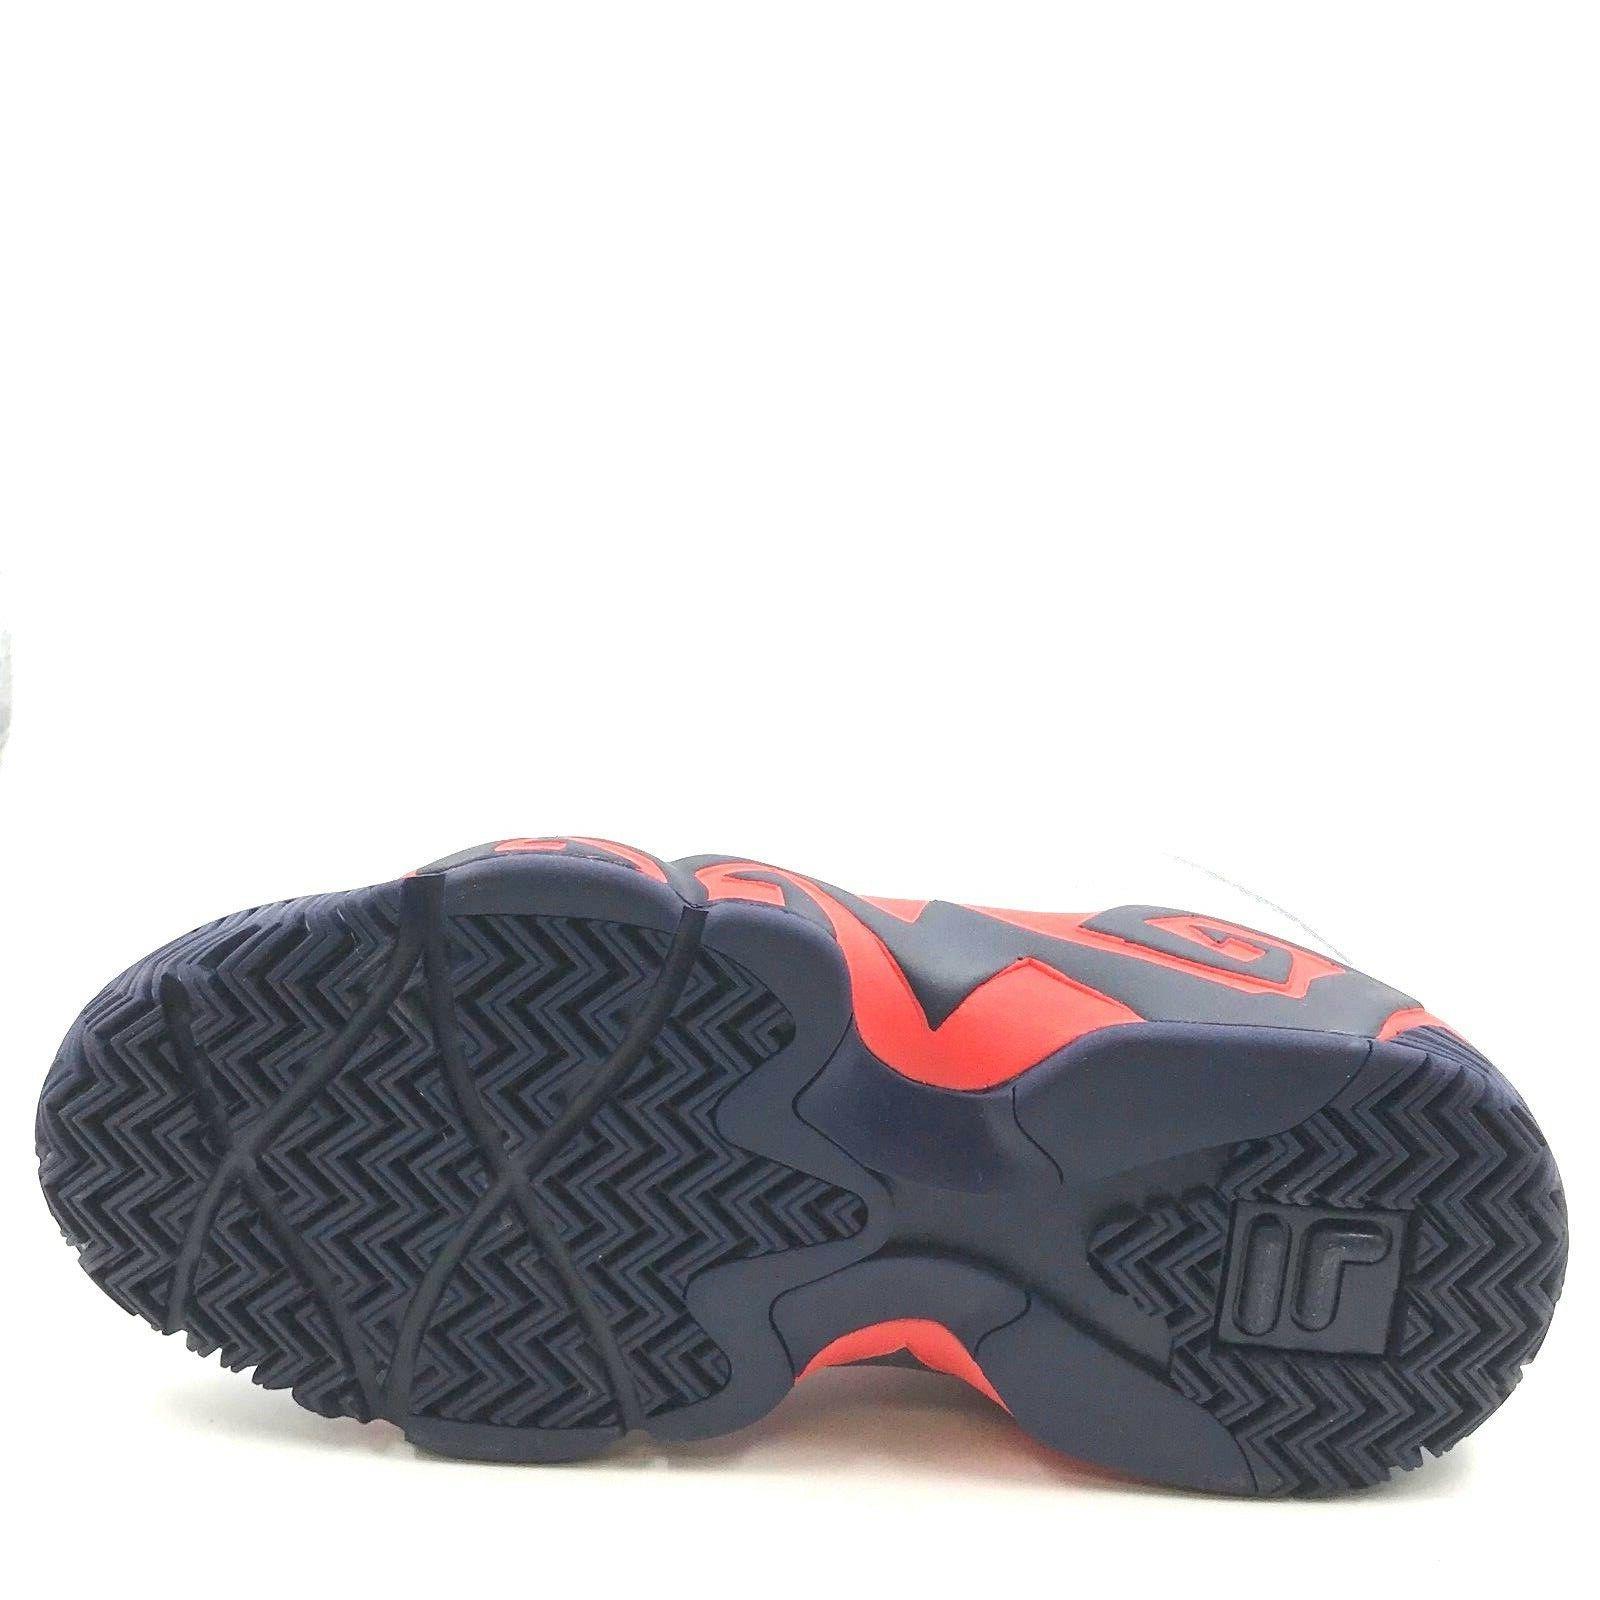 FILA MB Heritage Sneaker Wht/Ctom/Fnvy